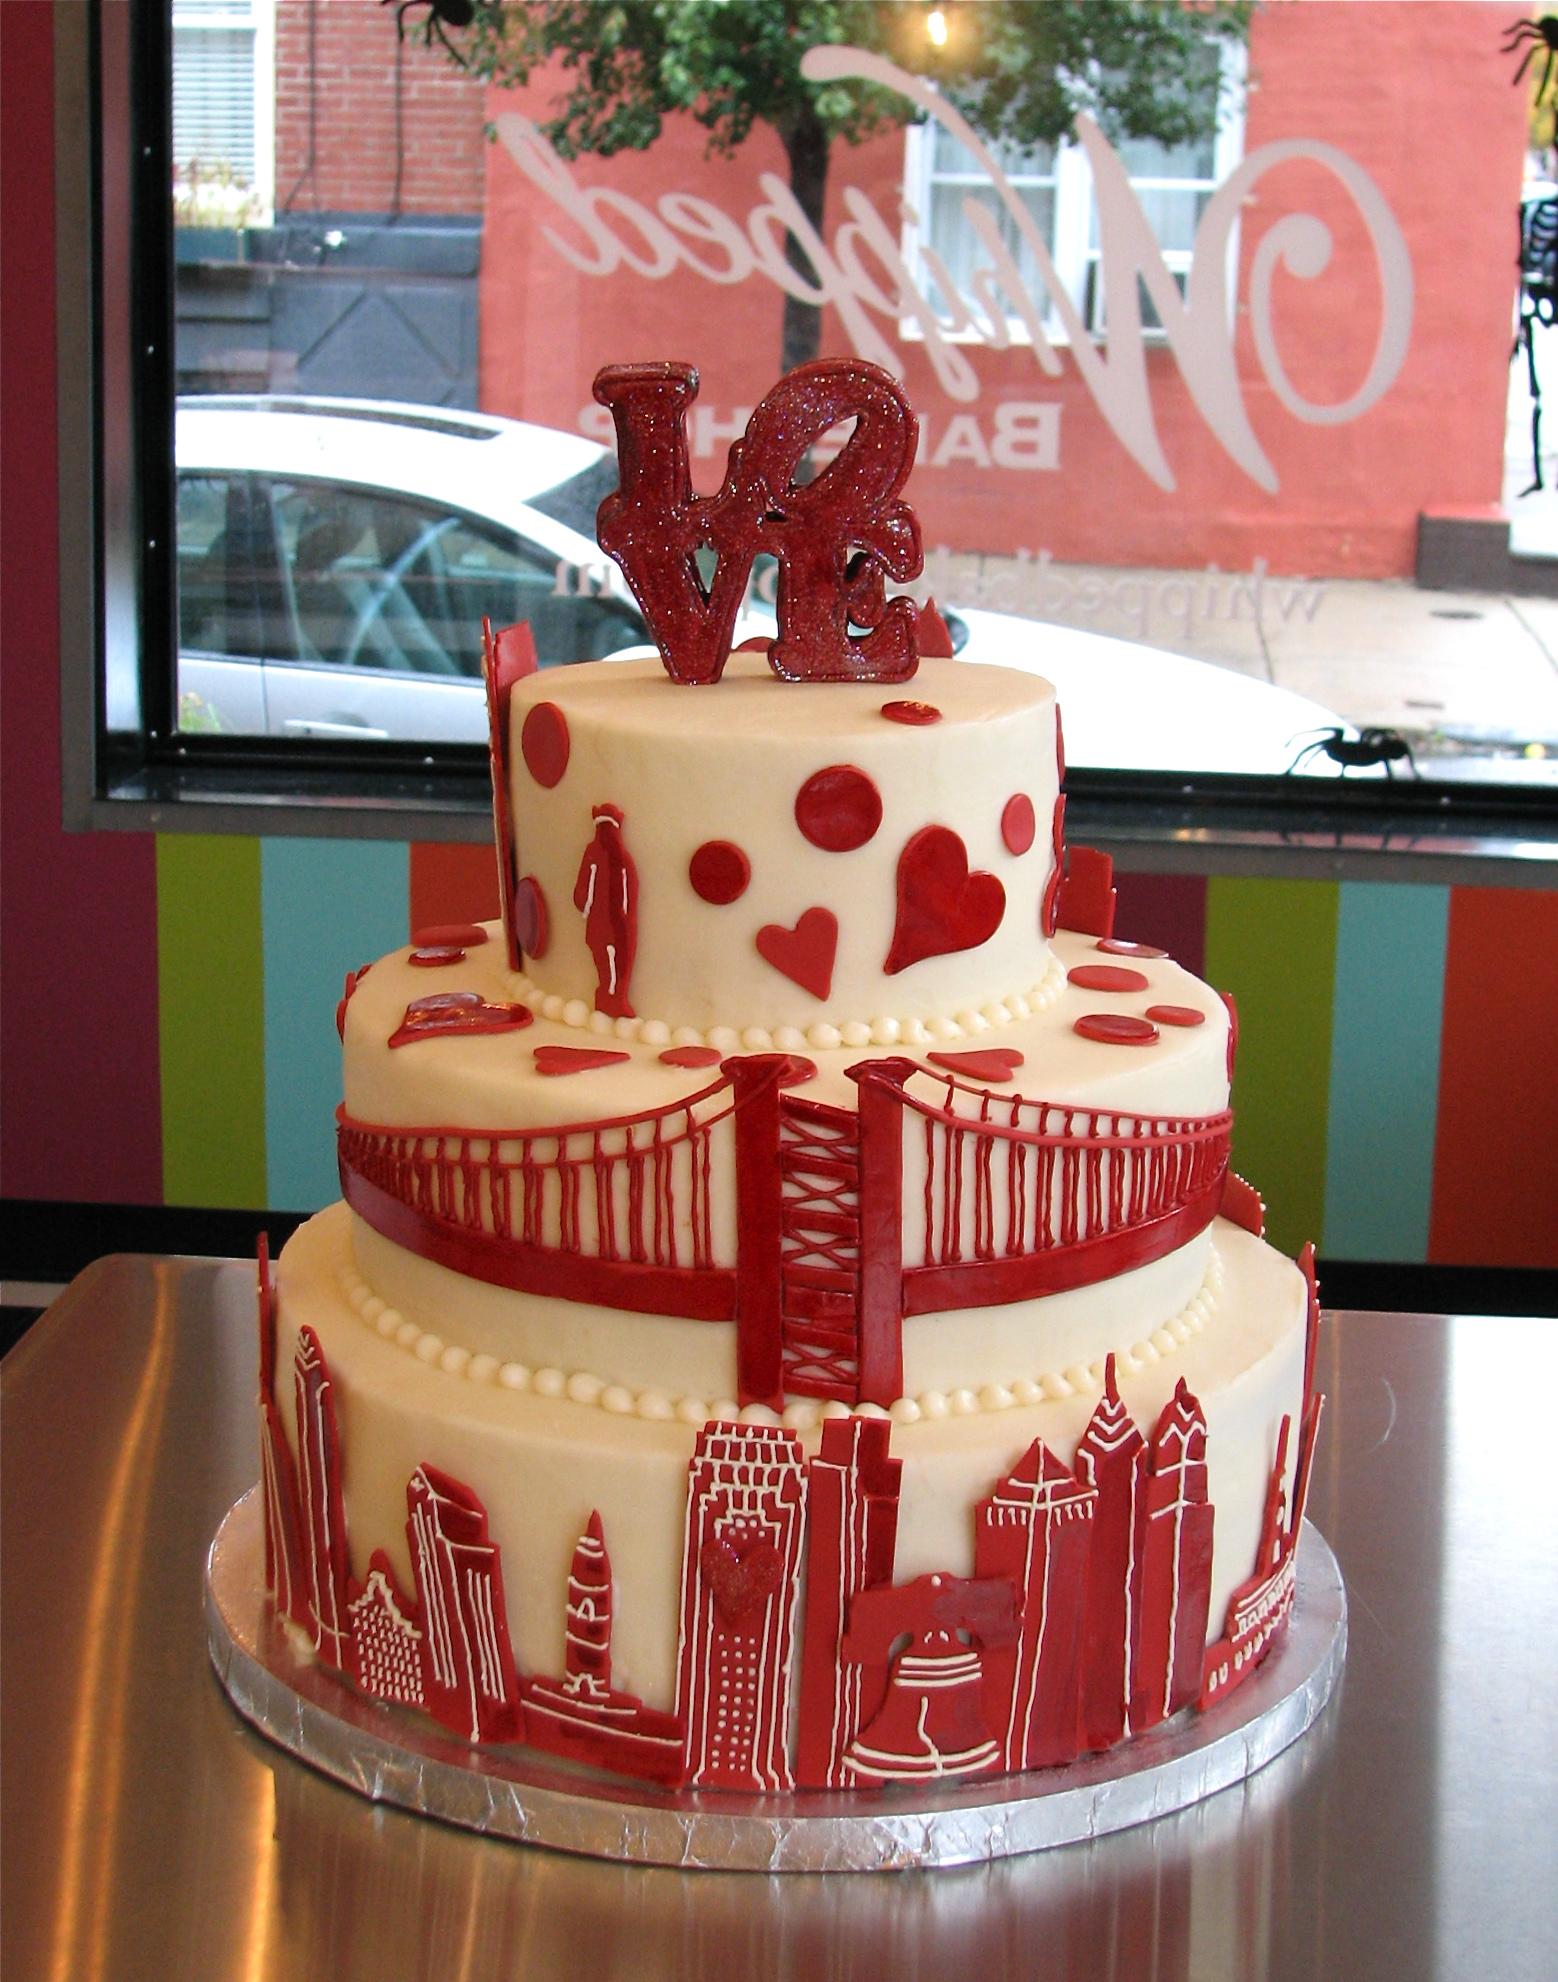 Seeking Sweetness in Everyday Life CakeSpy